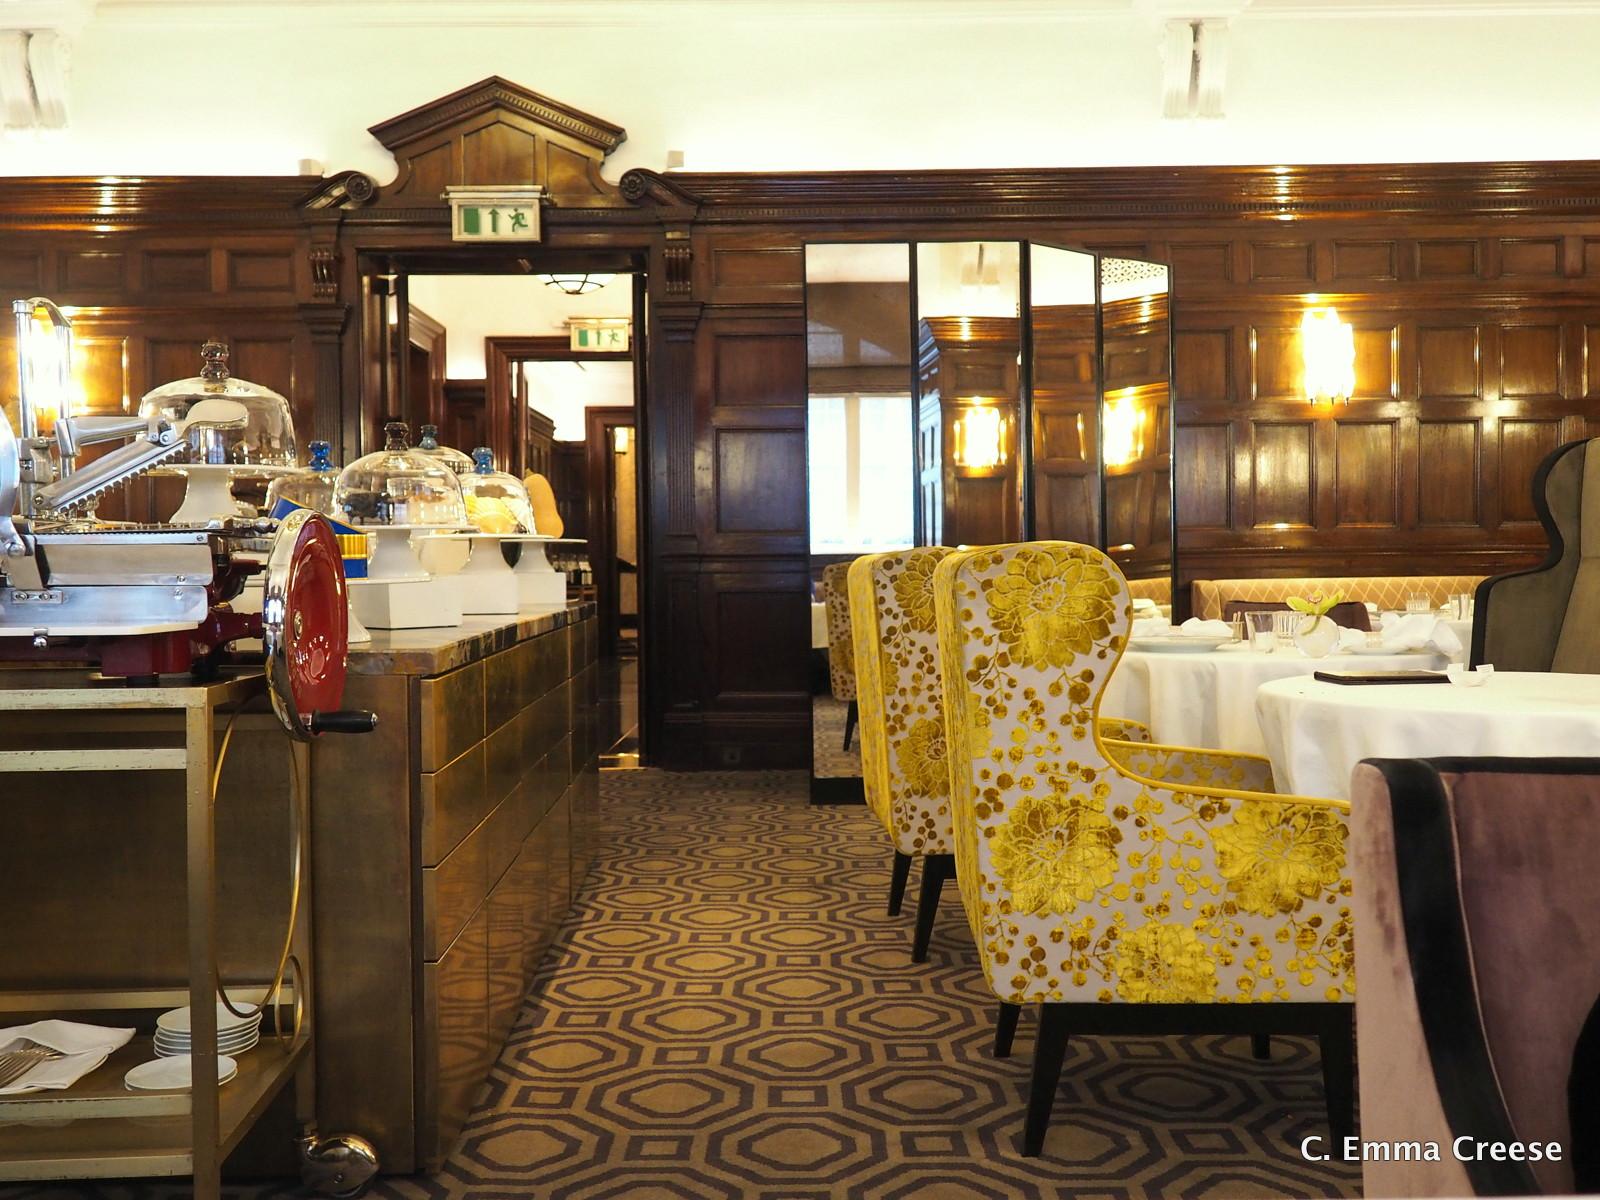 Hélène Darroze at The Connaught Hotel Mayfair Michelin Starred Adventures of a London Kiwi